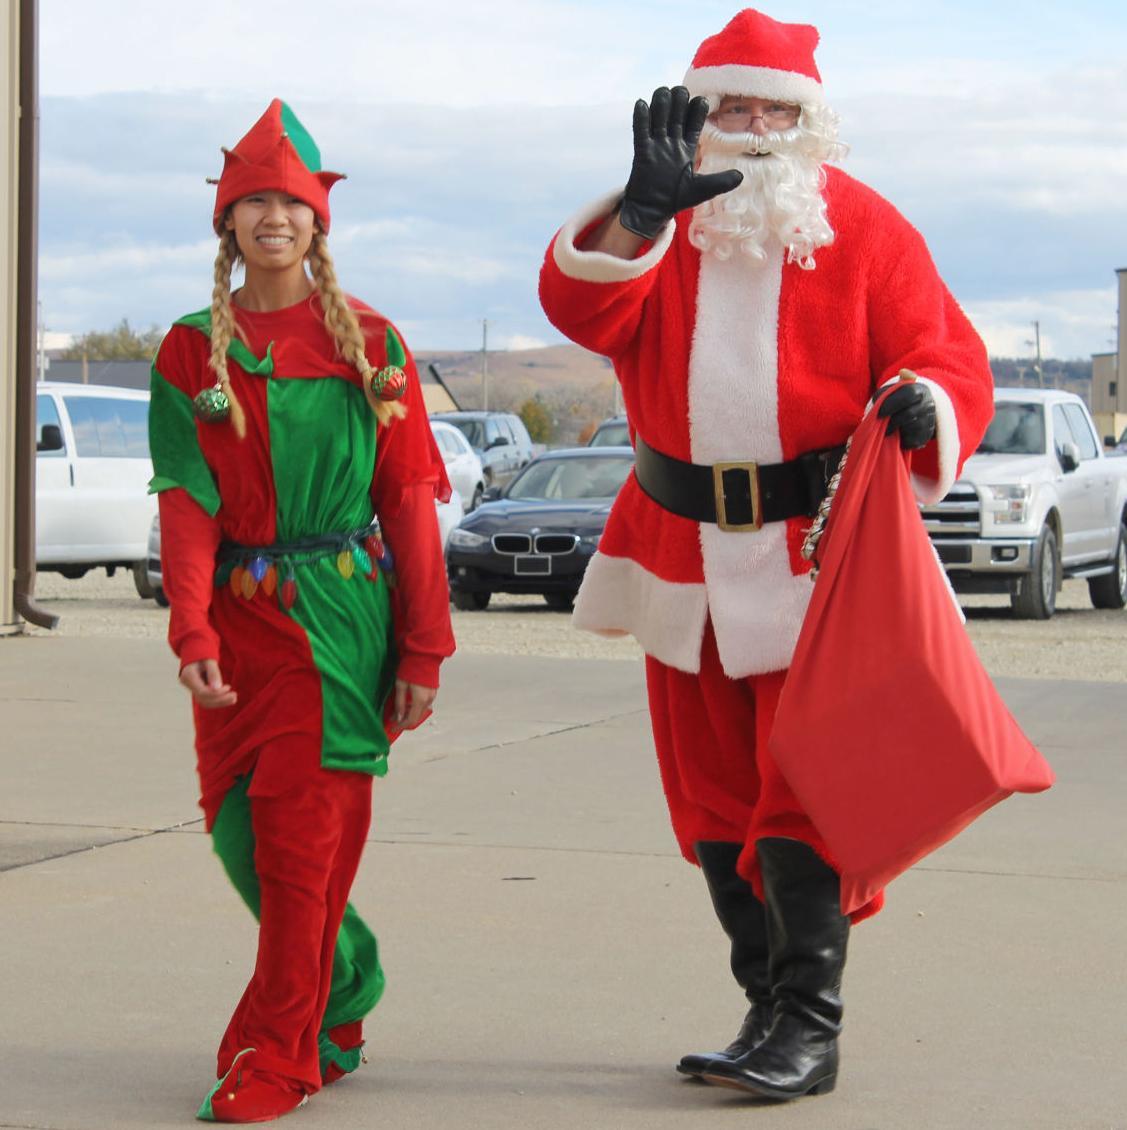 U.S. Army kicks off annual Operation Santa Claus program at Fort Riley